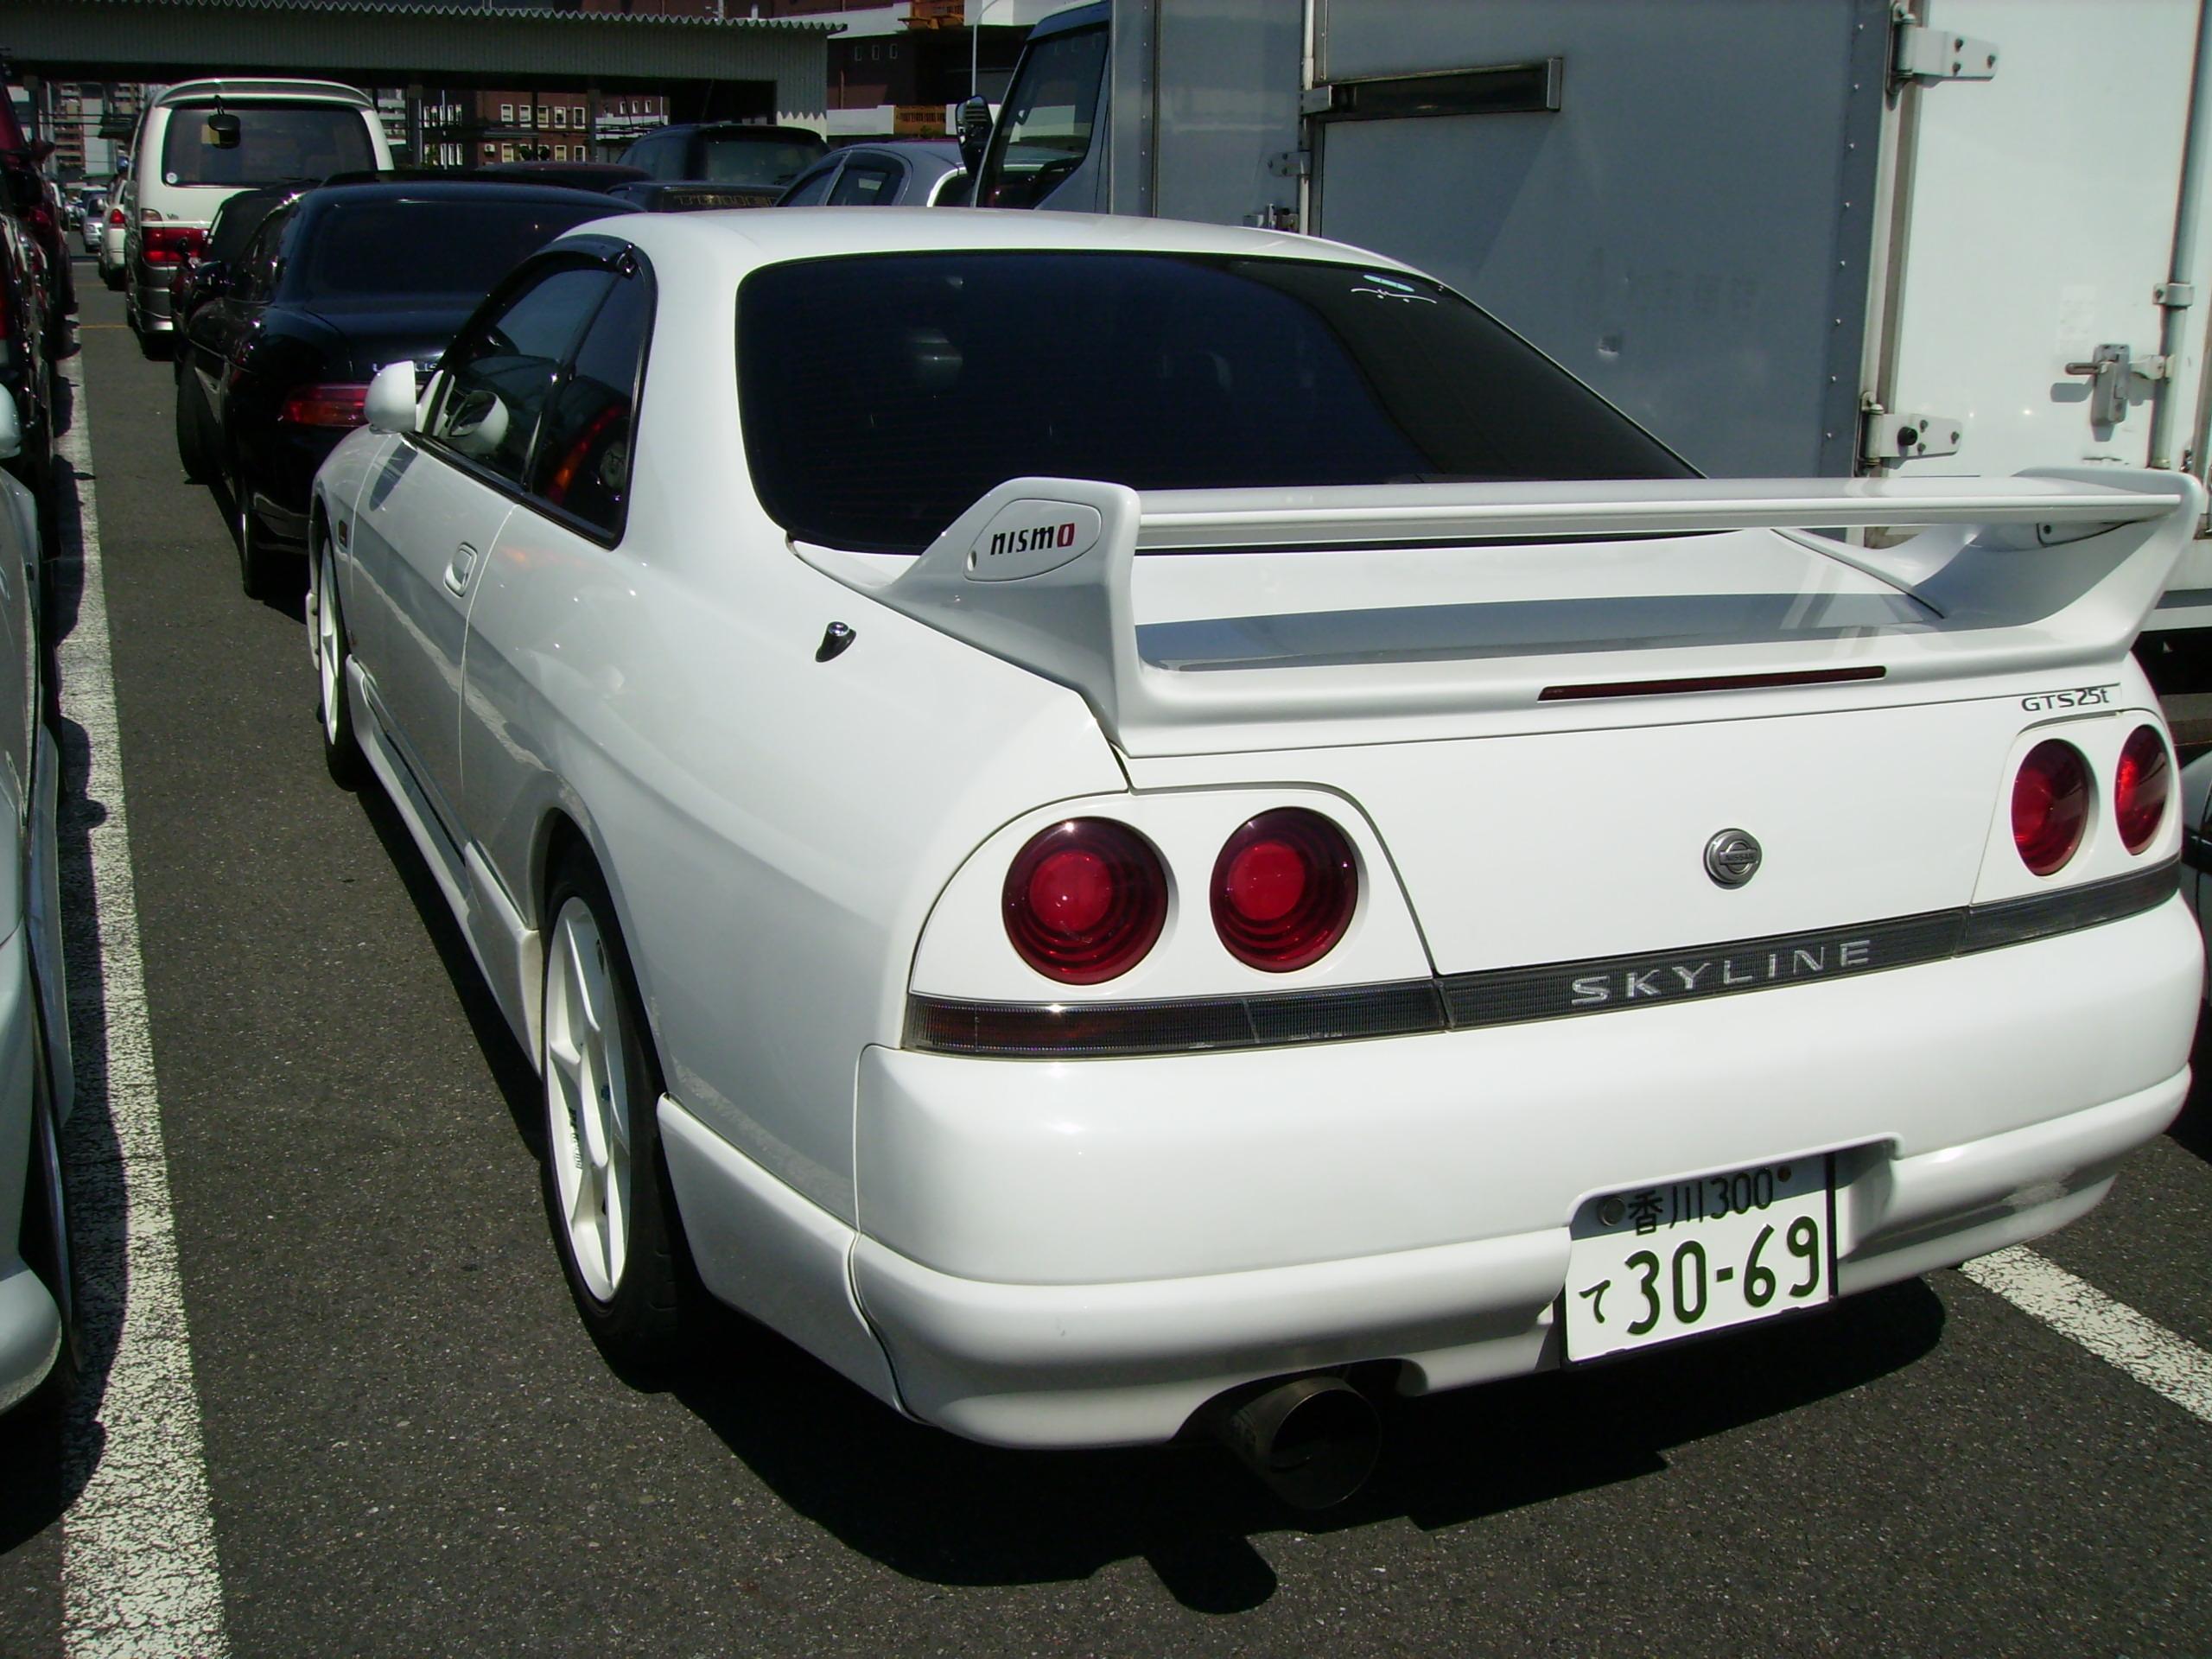 Skyline R33 Gts-t rear